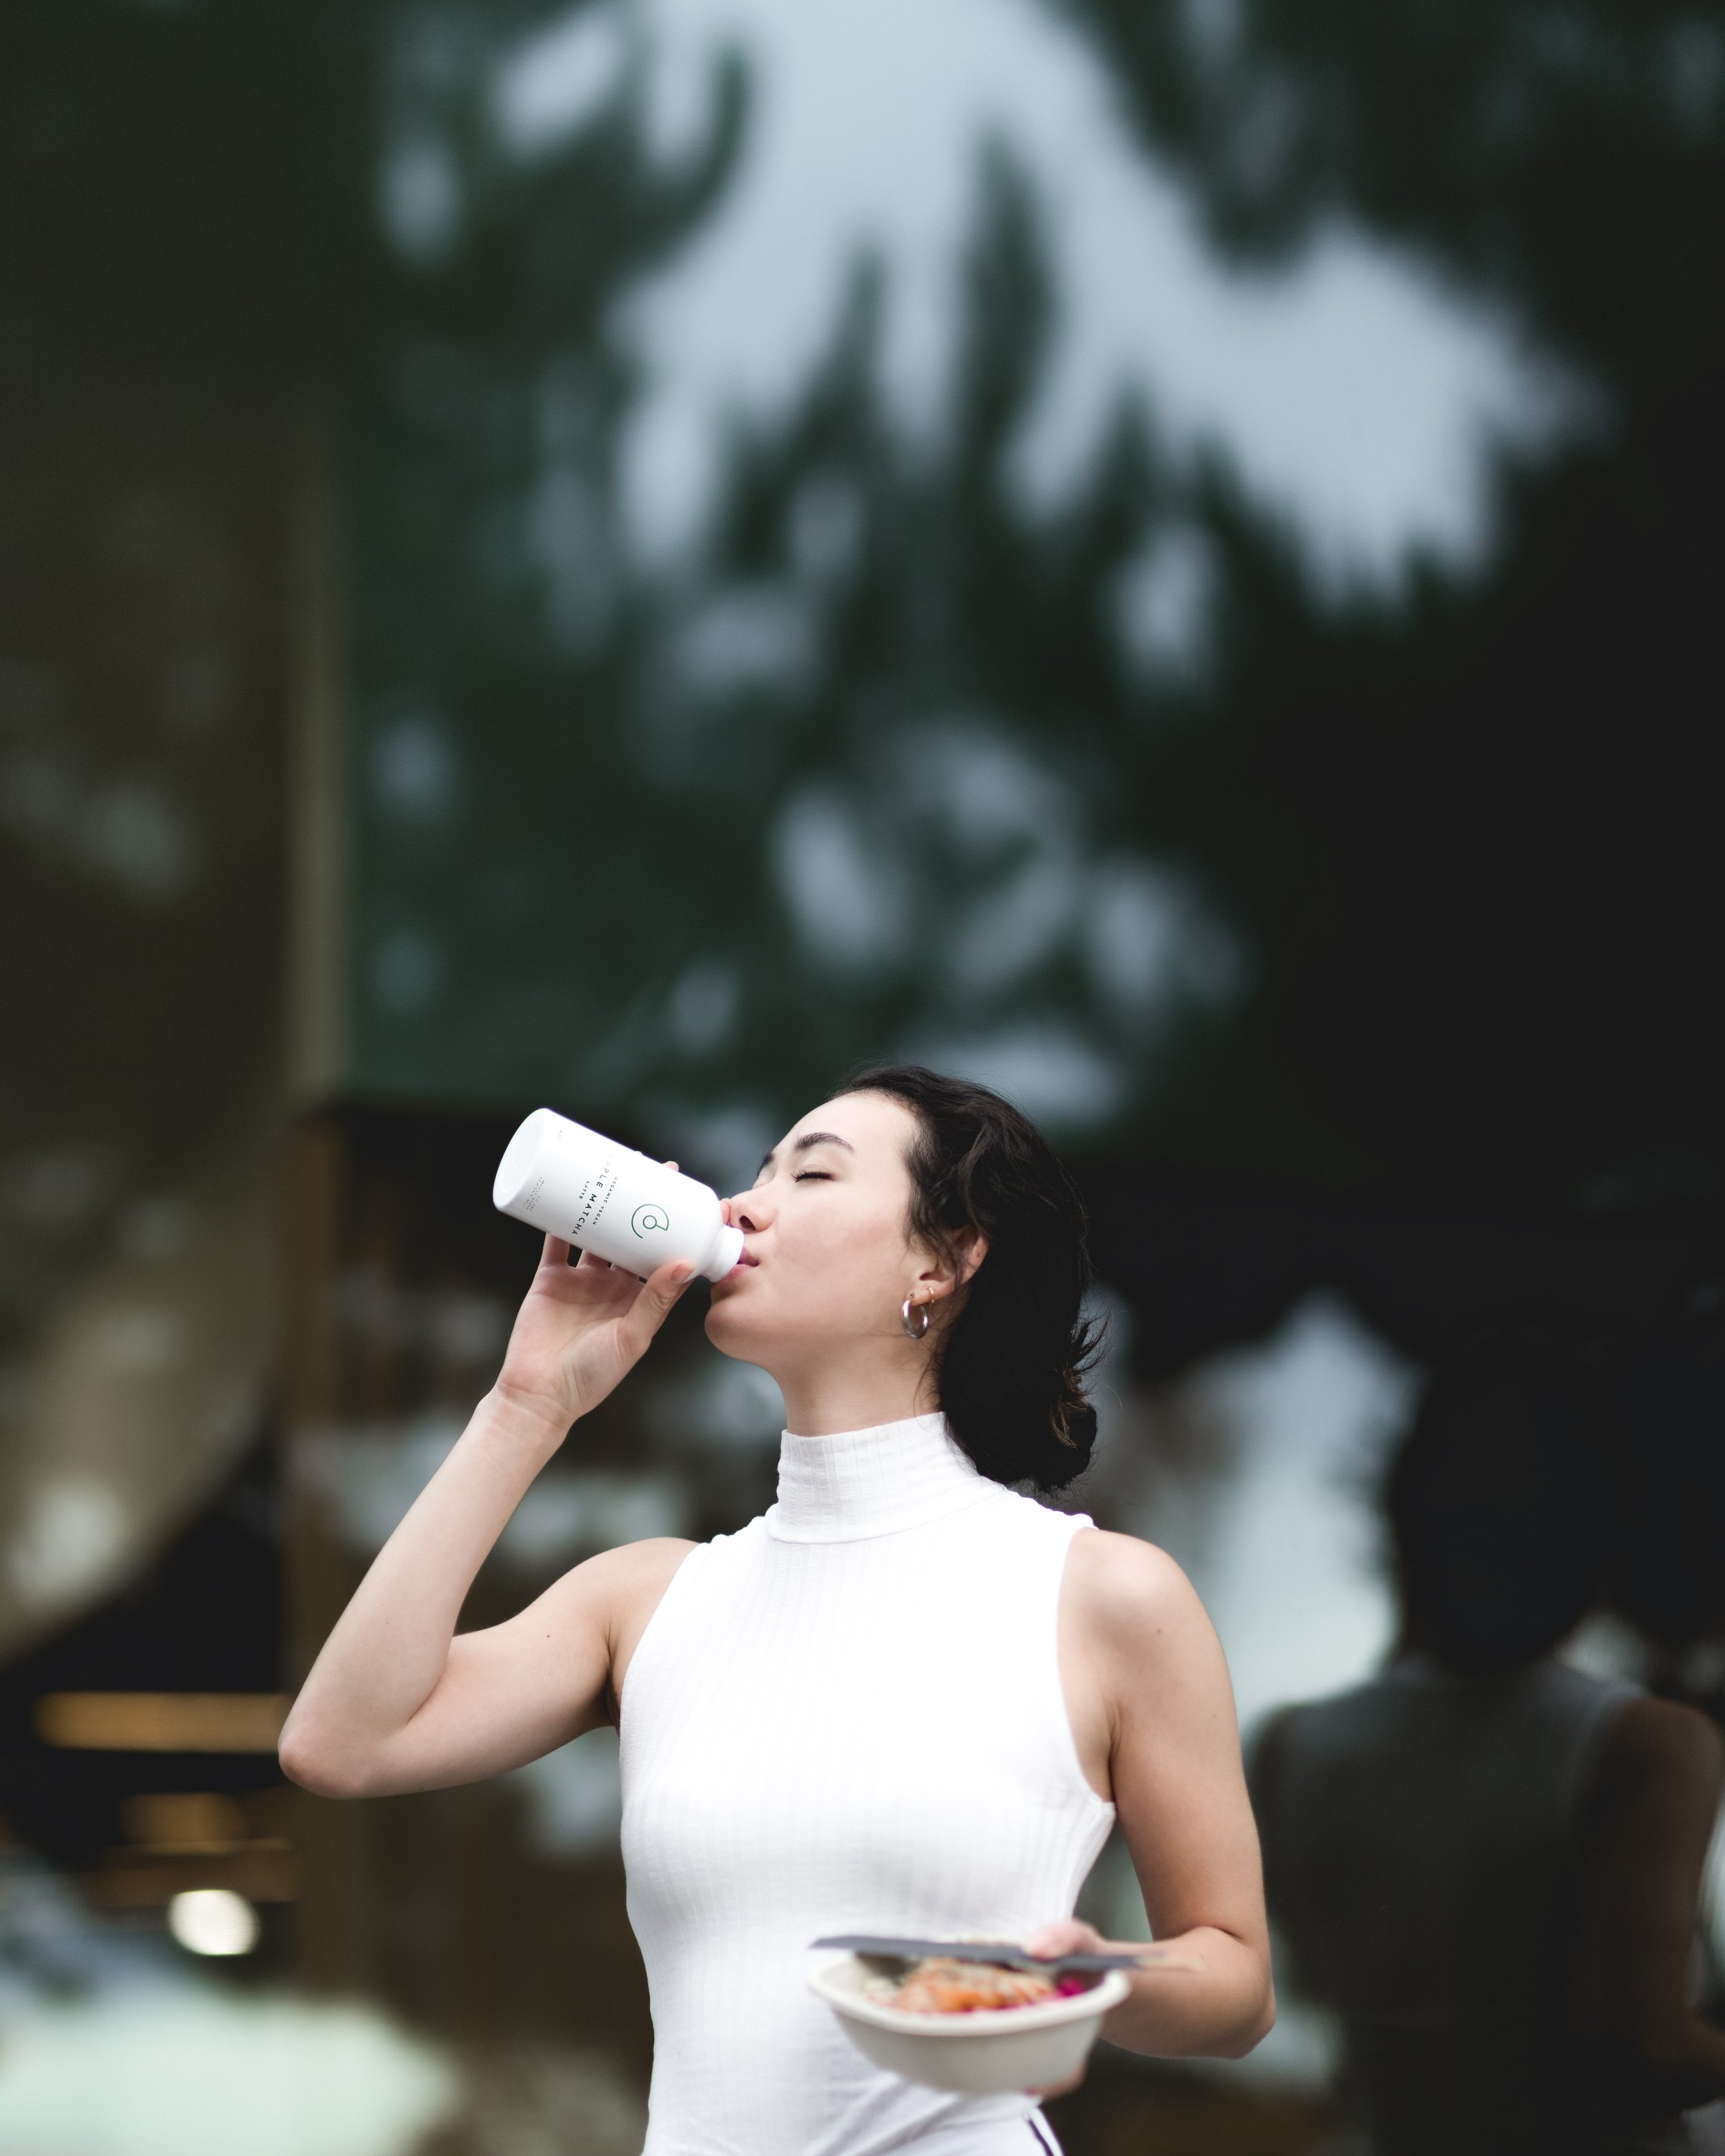 matcha latte.jpg.jpeg